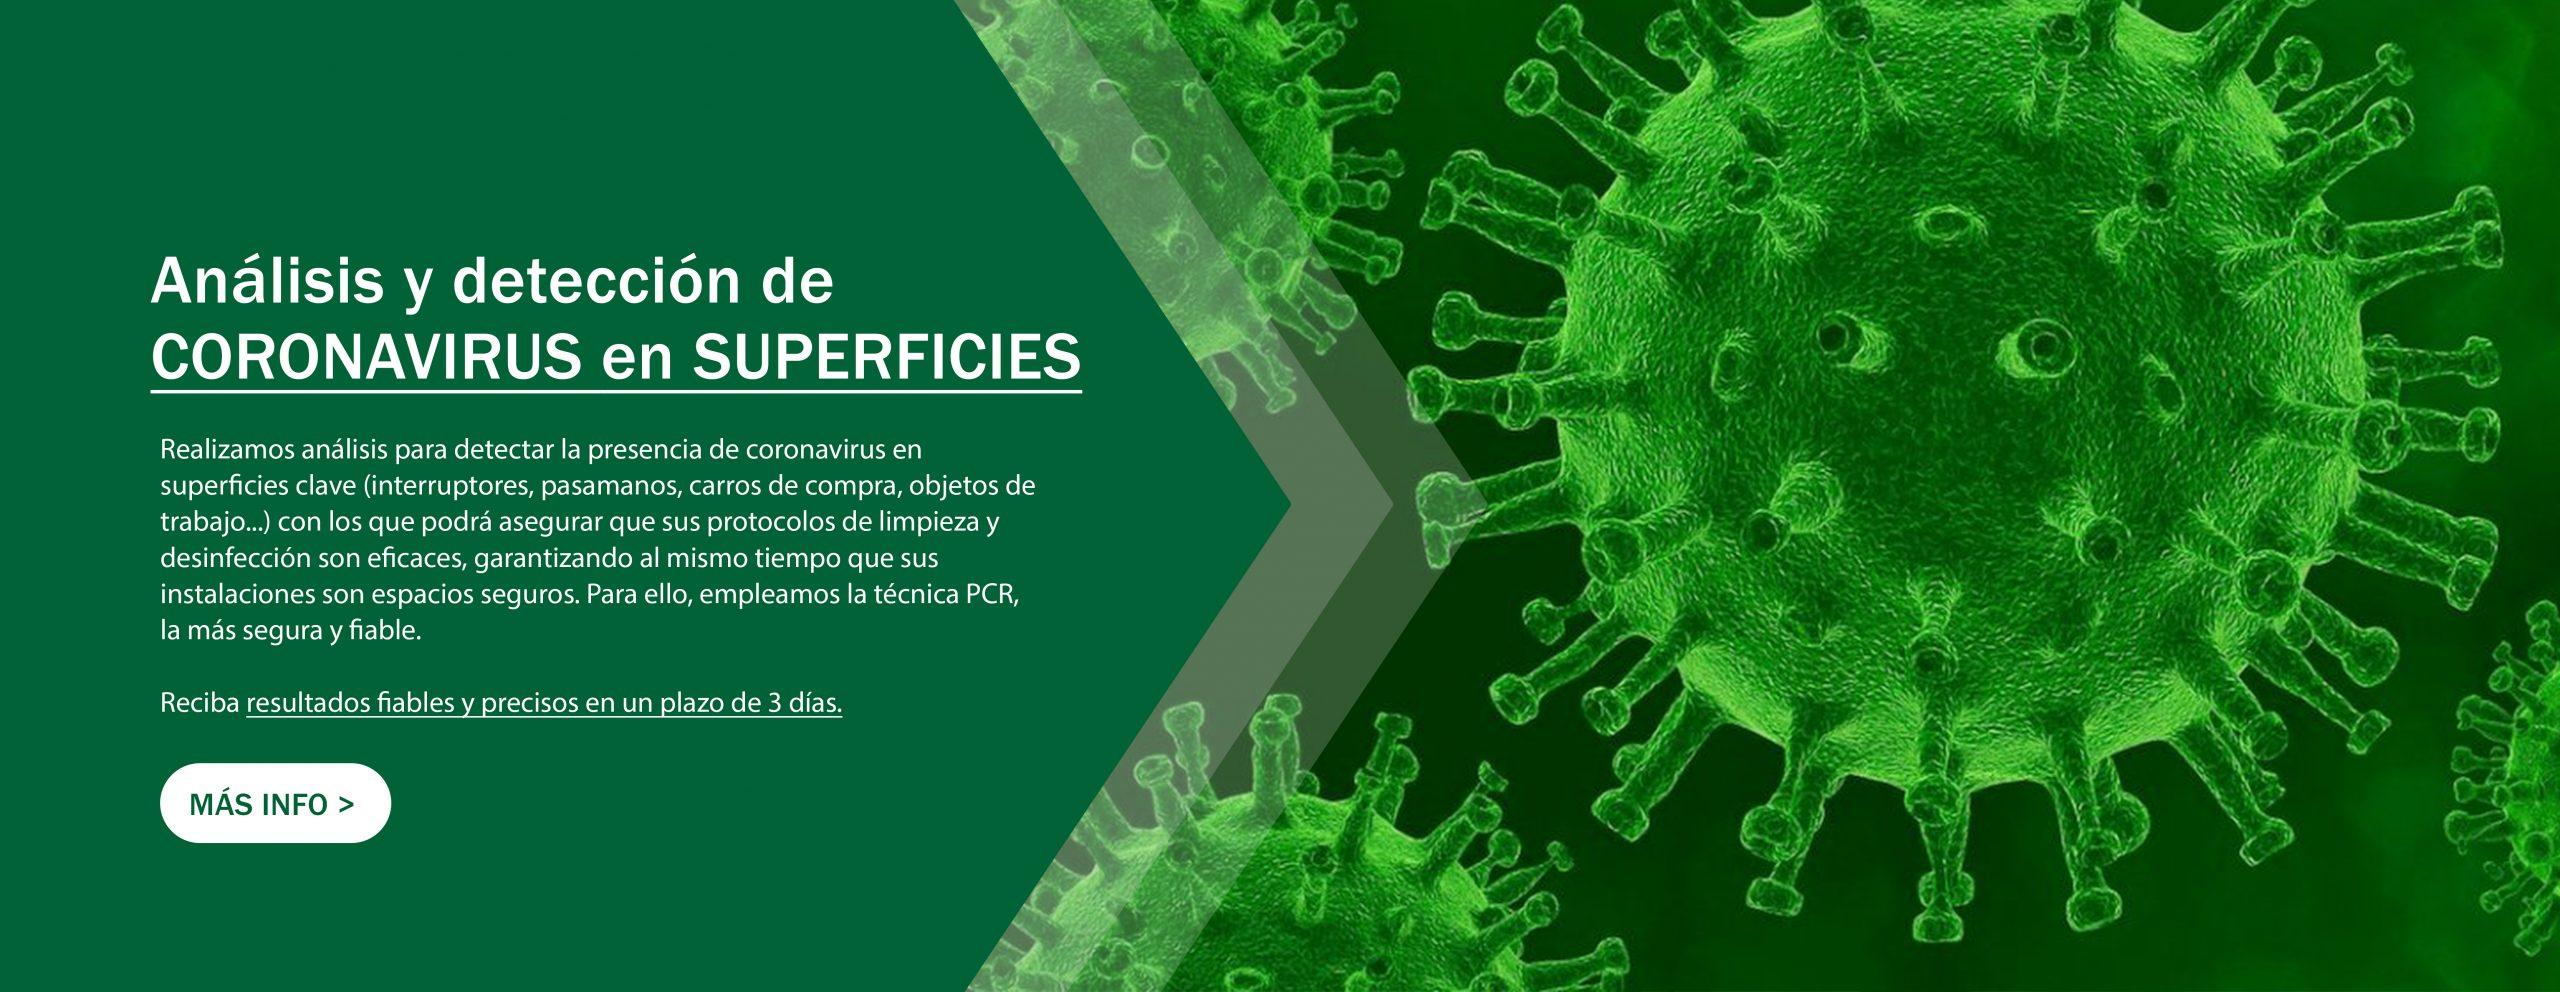 Análisis de coronavirus en superficie - Laboratorio KUDAM